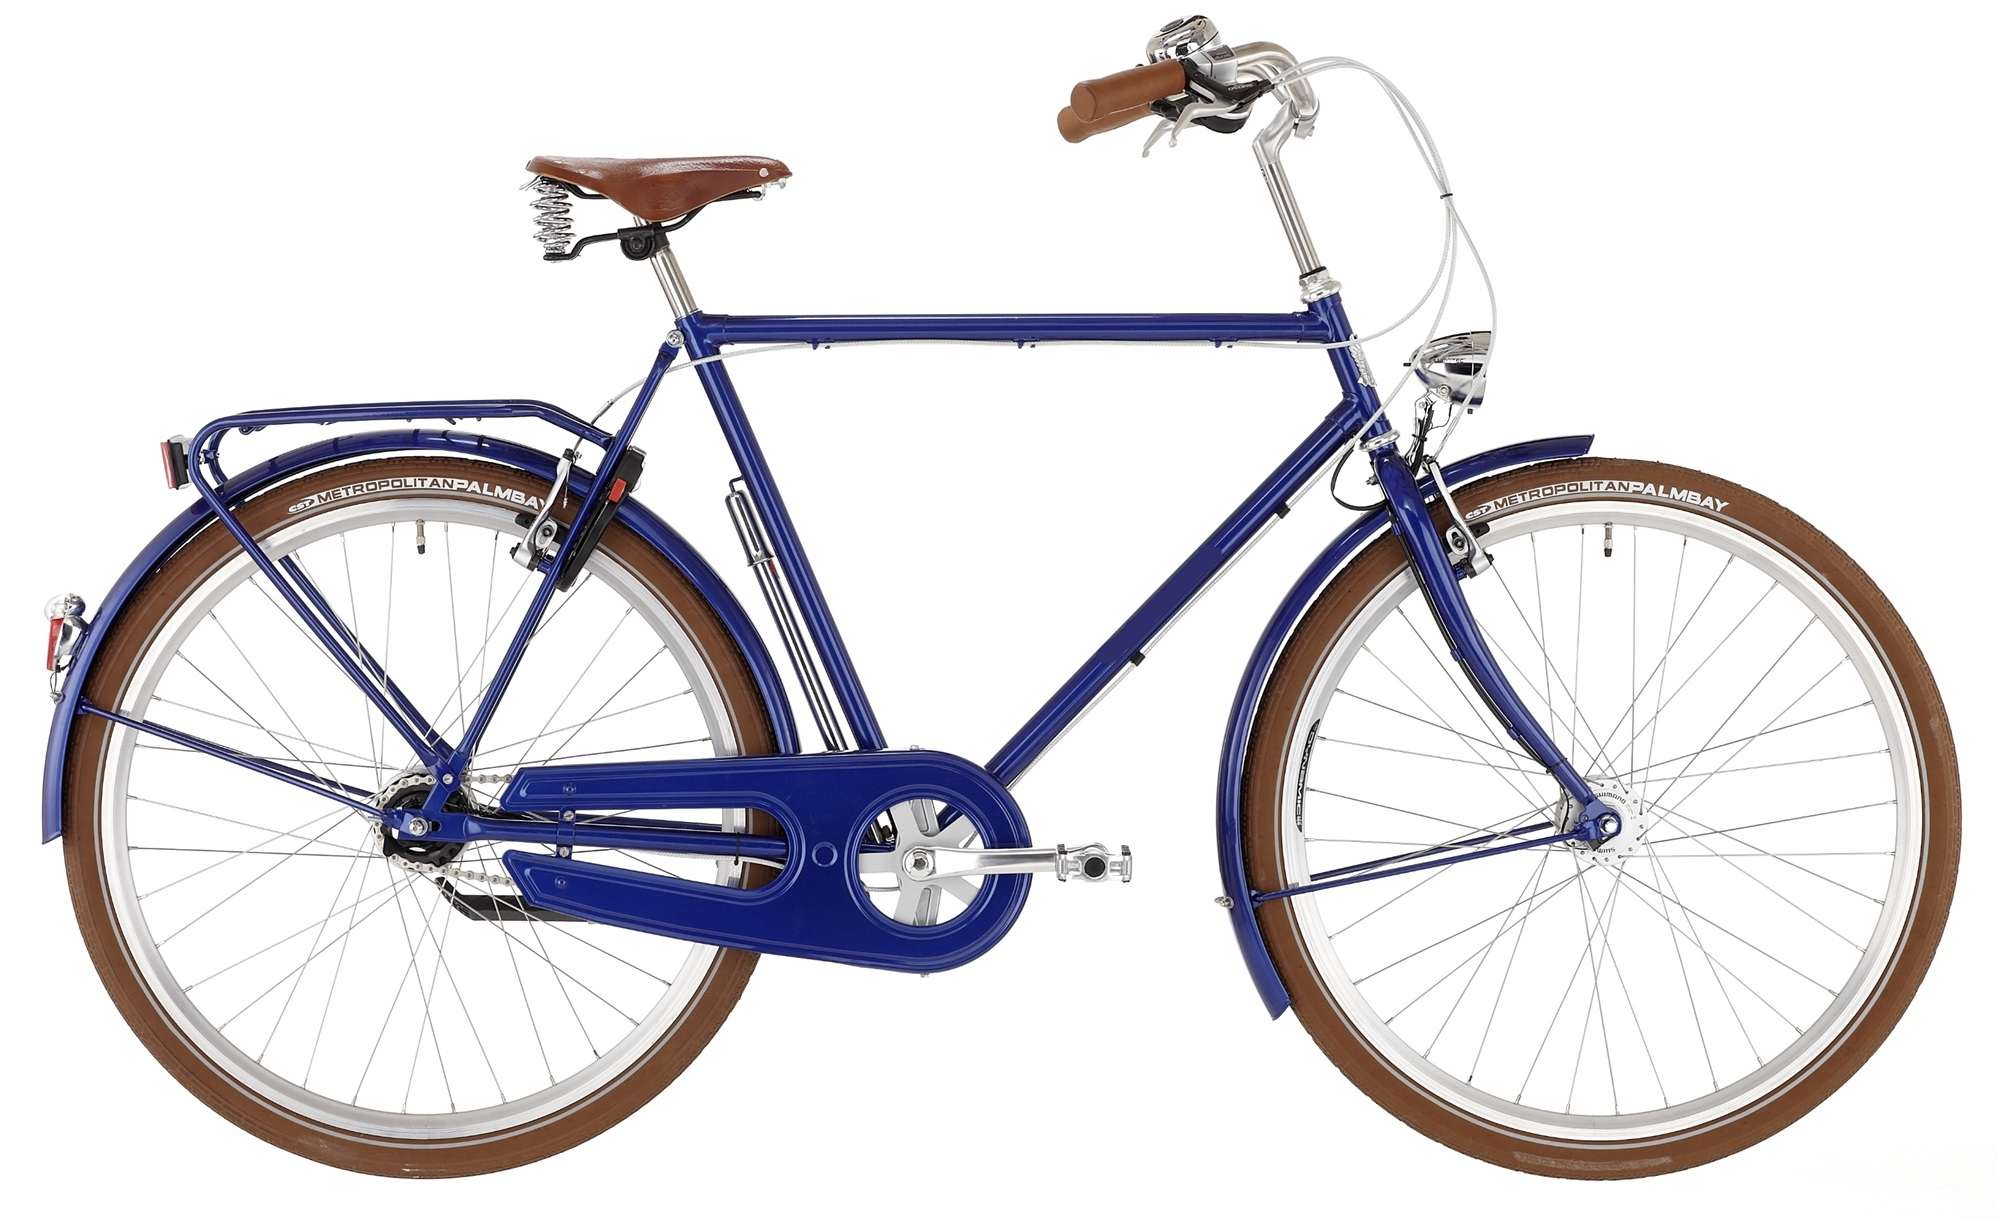 nostalgie retro fahrrad greenbike. Black Bedroom Furniture Sets. Home Design Ideas